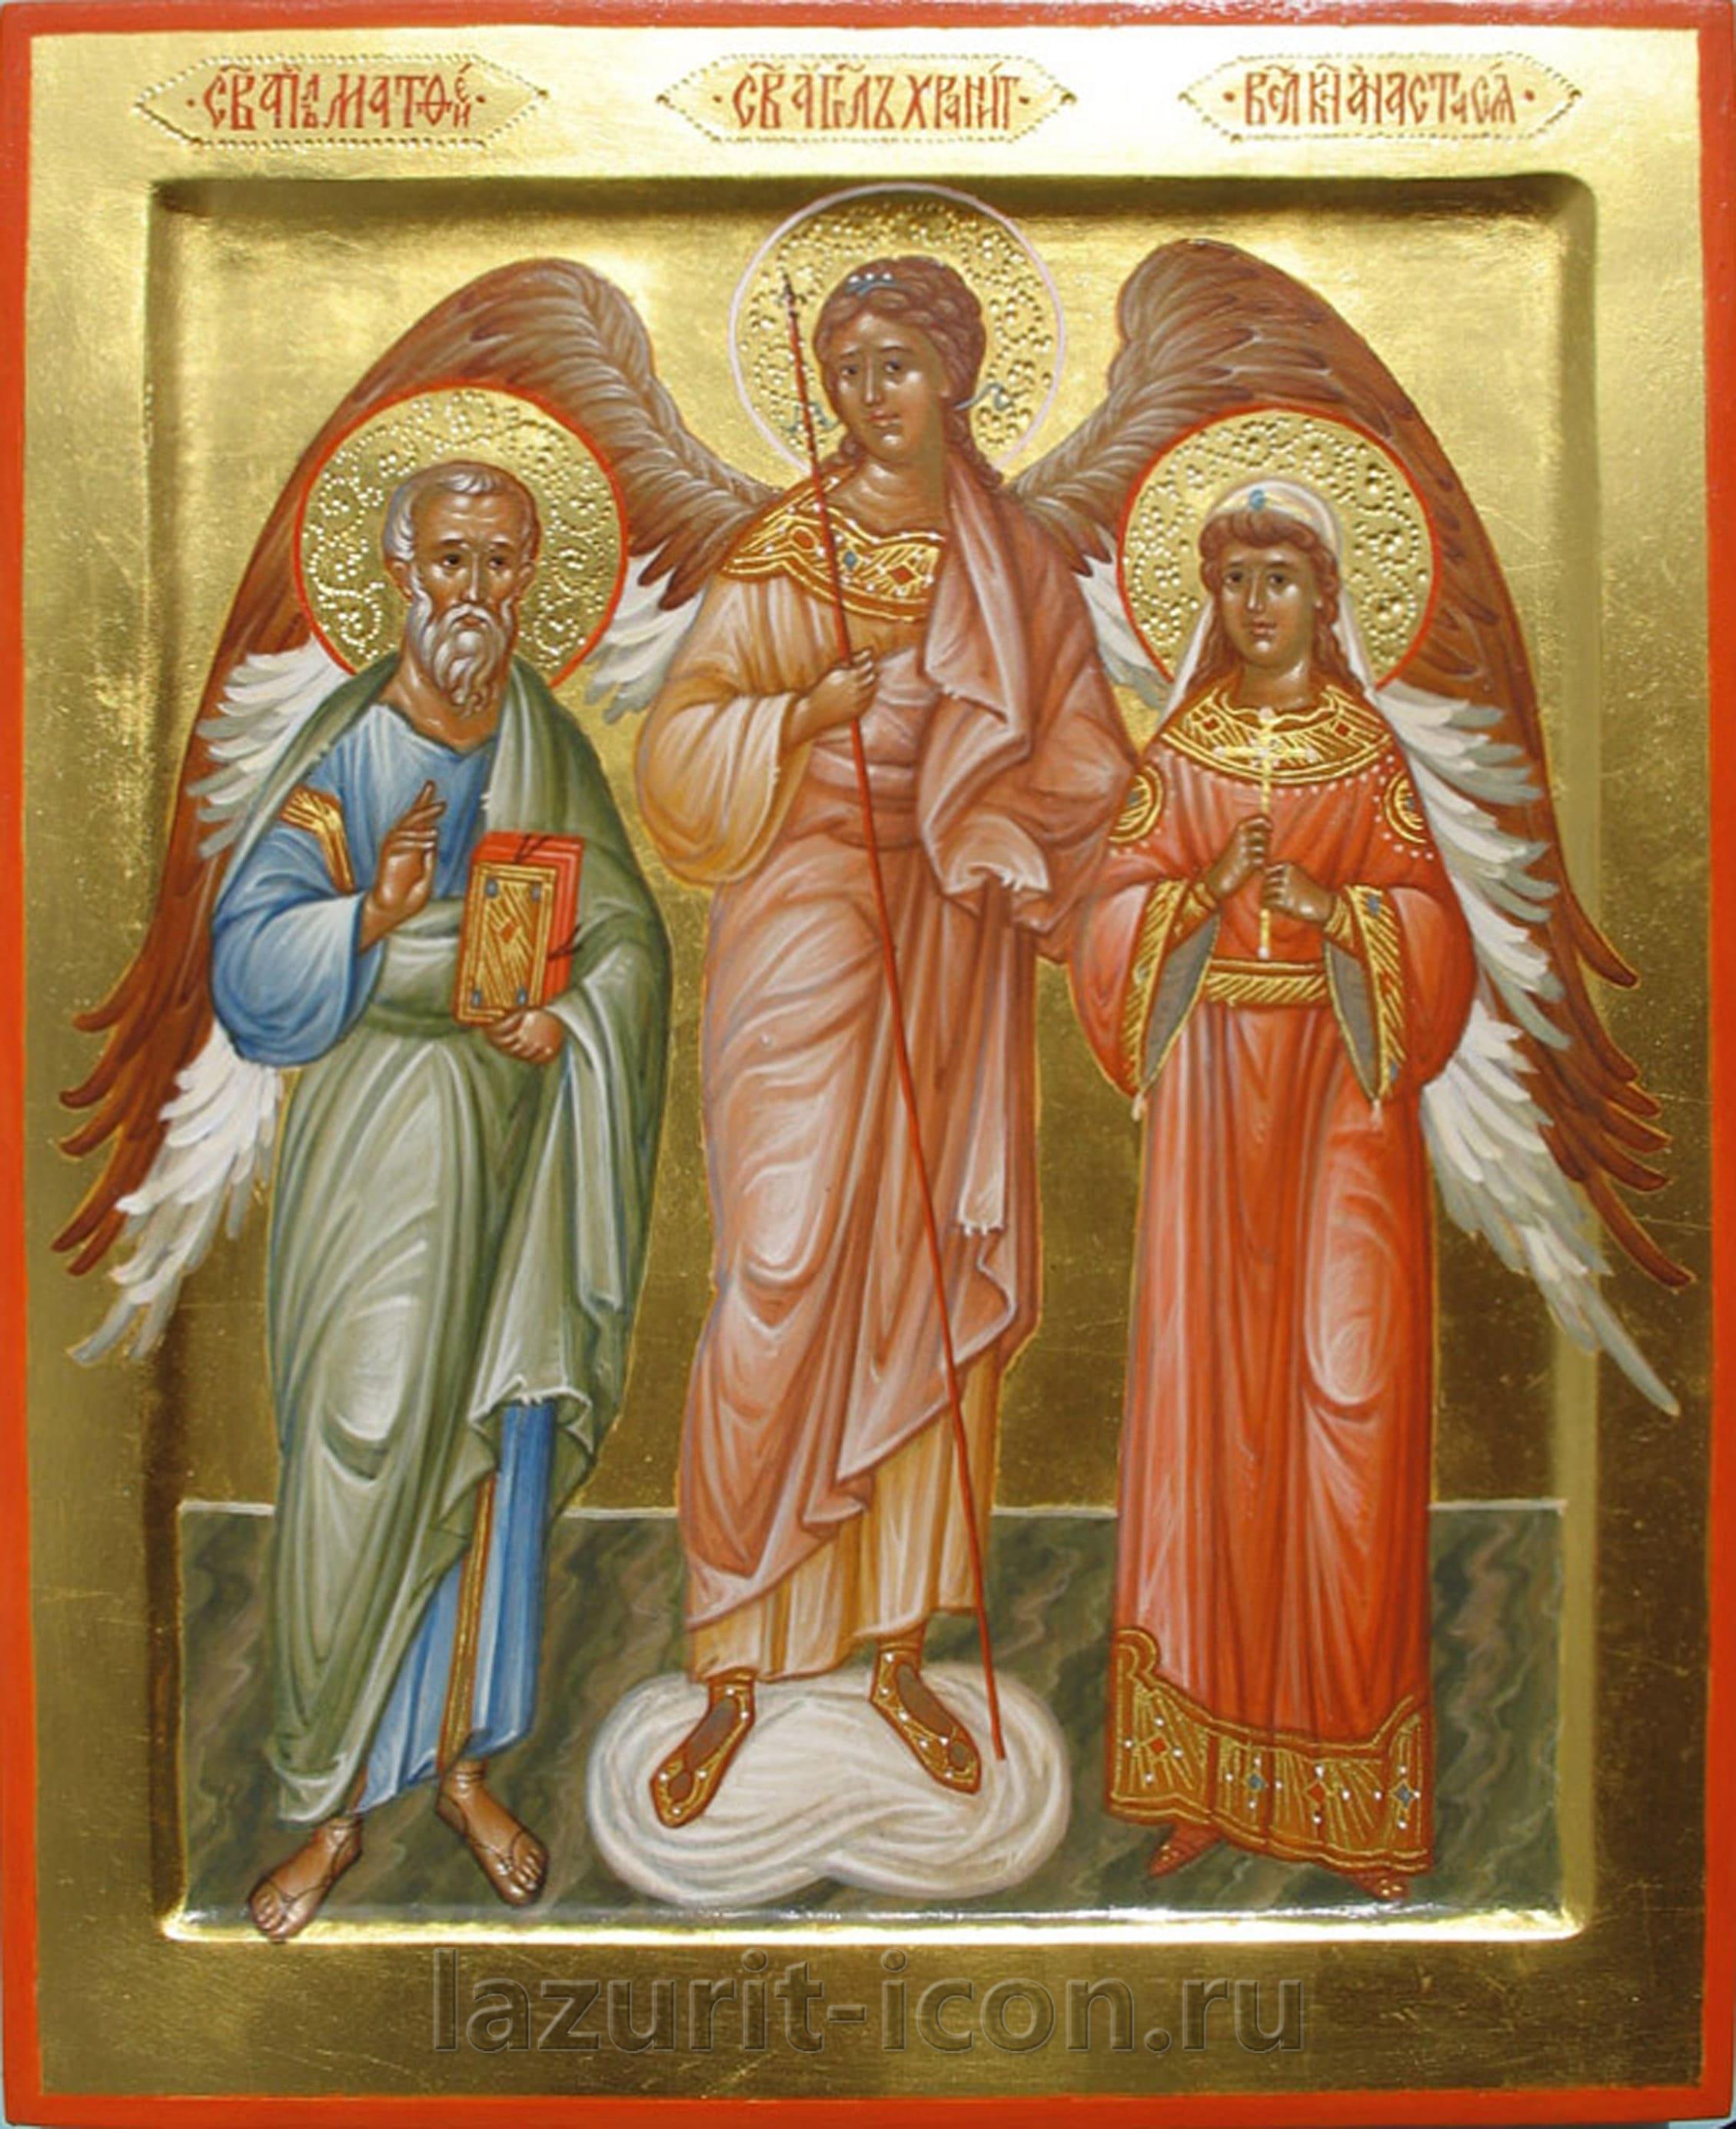 апостол Матфей, княжна Анастасия, Ангел Хранитель